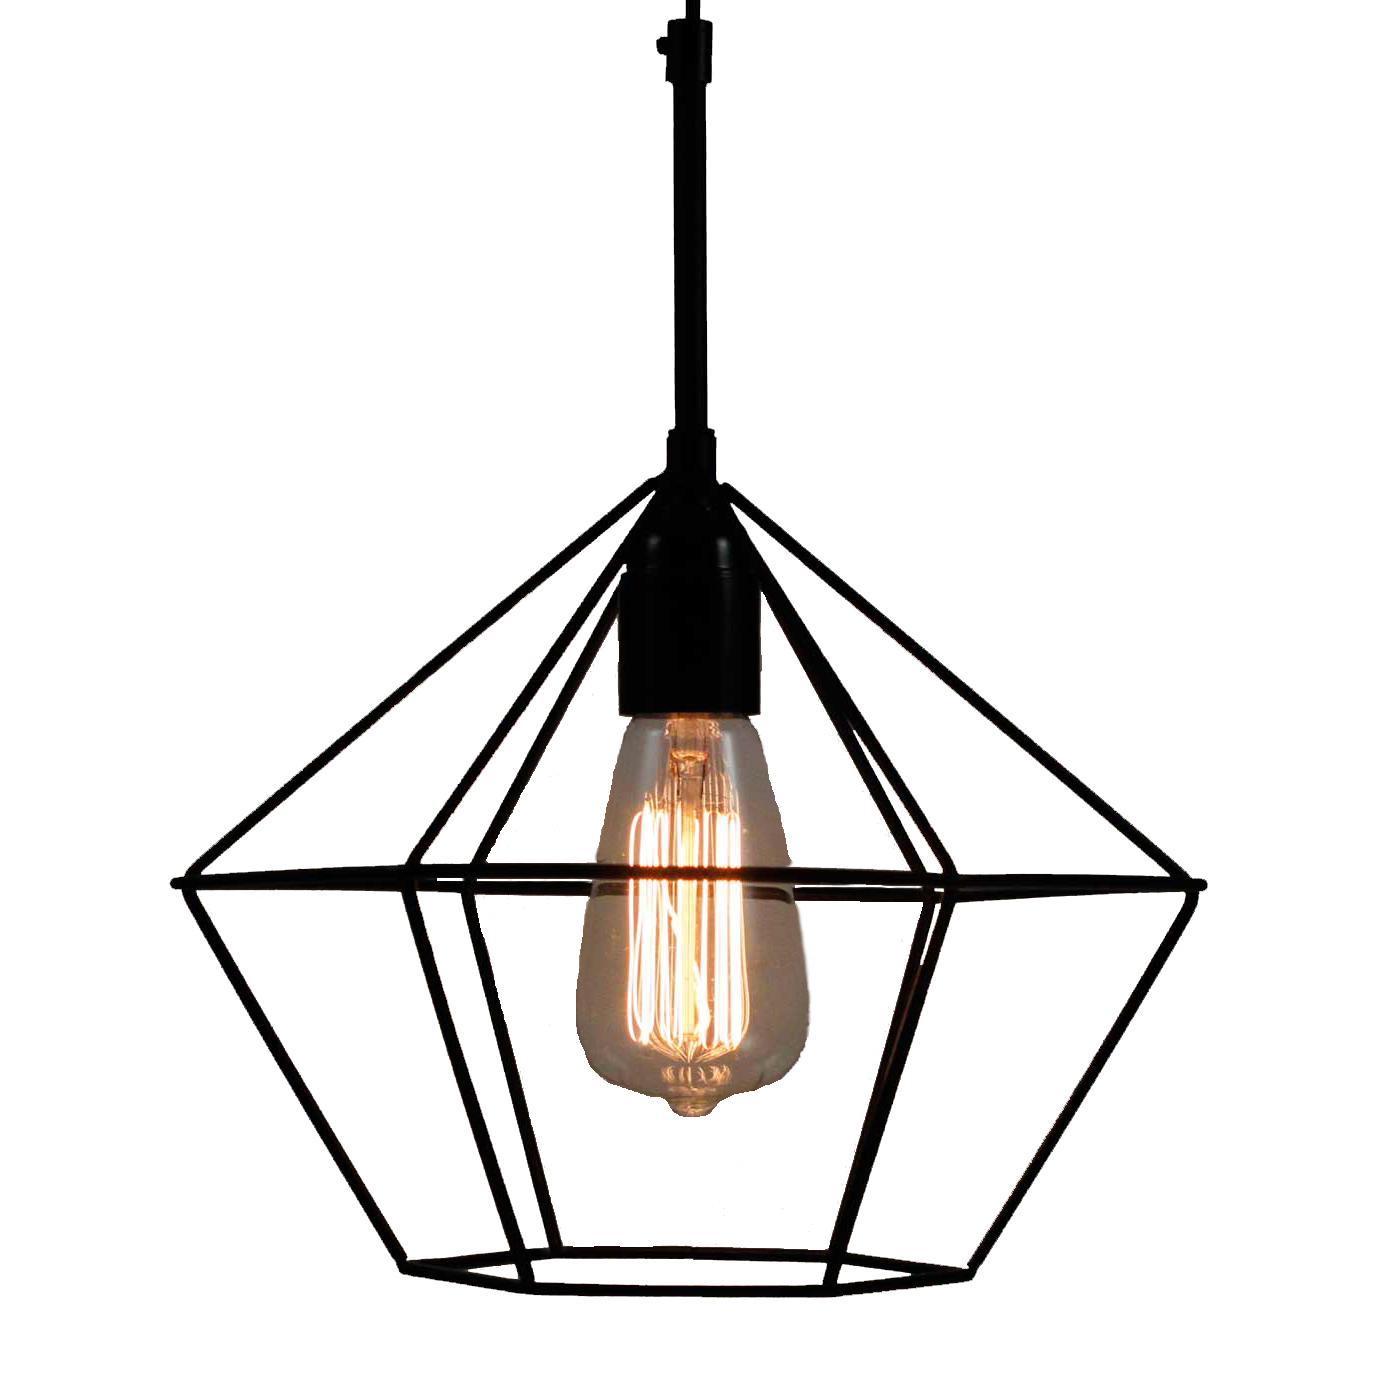 Black Diamond Wire Cage Pendant Light | Temple & Webster